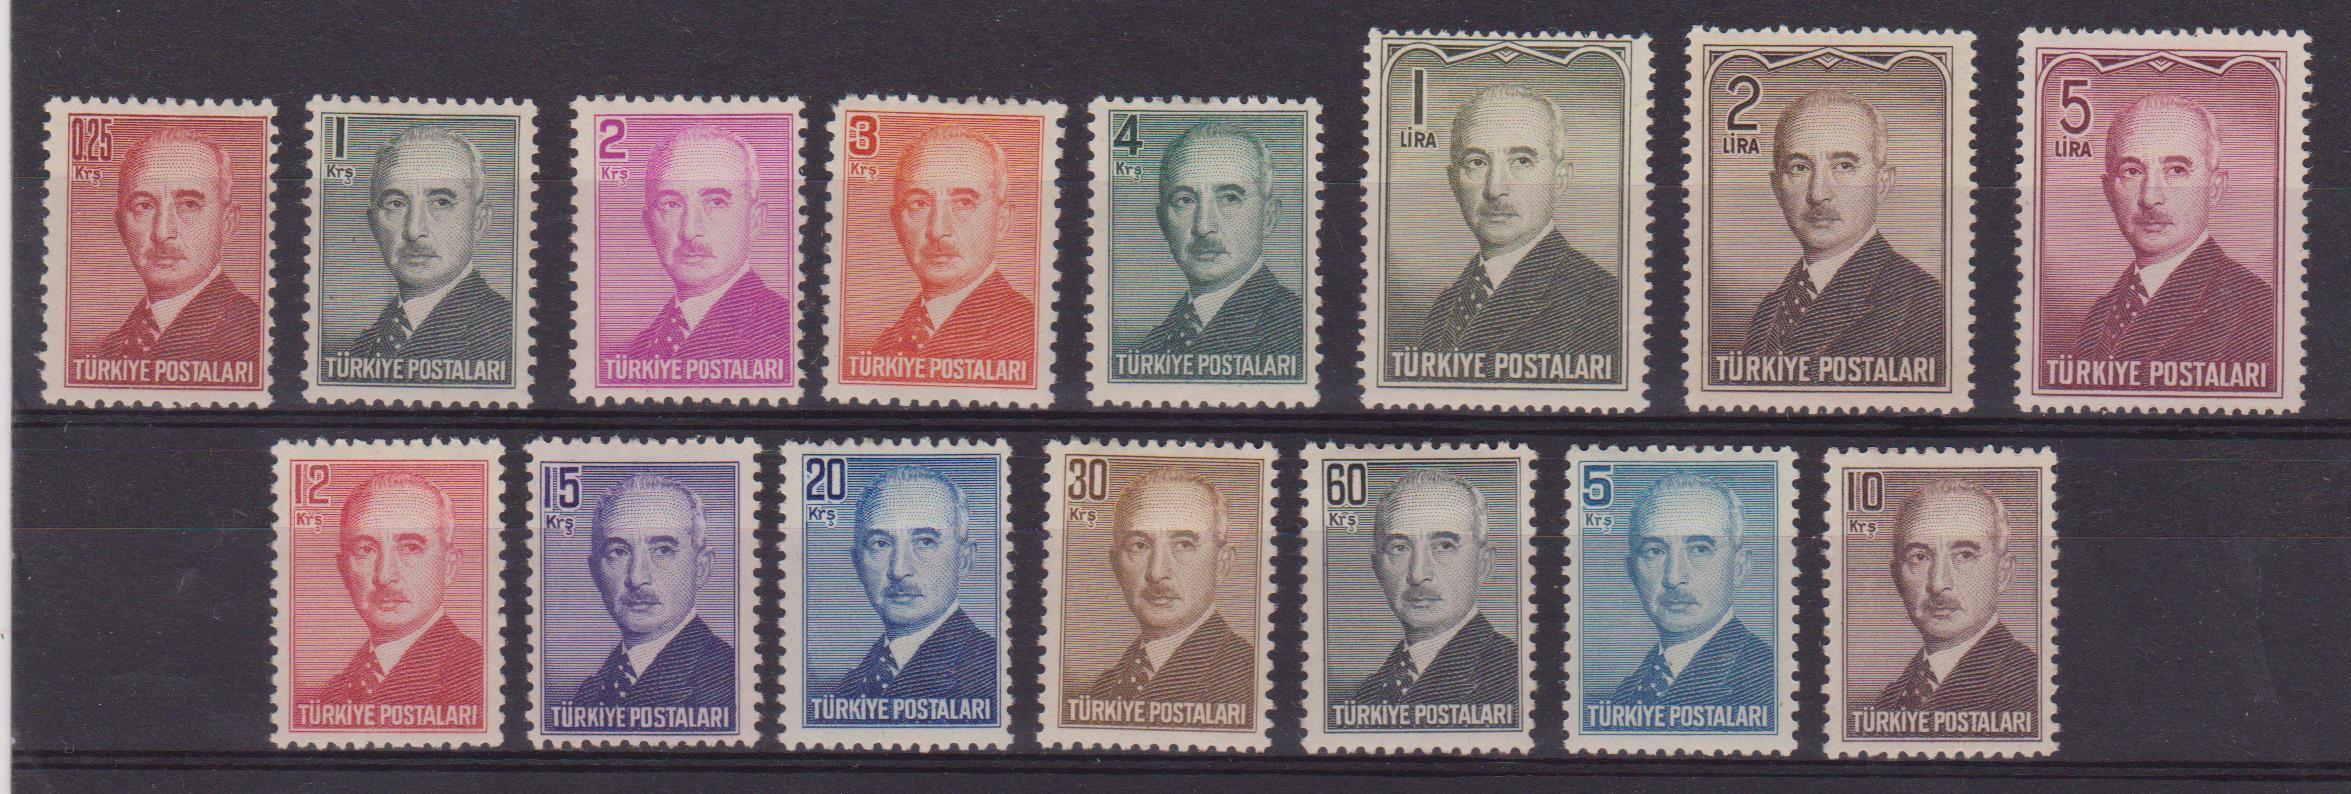 Turchia 1060-74 001